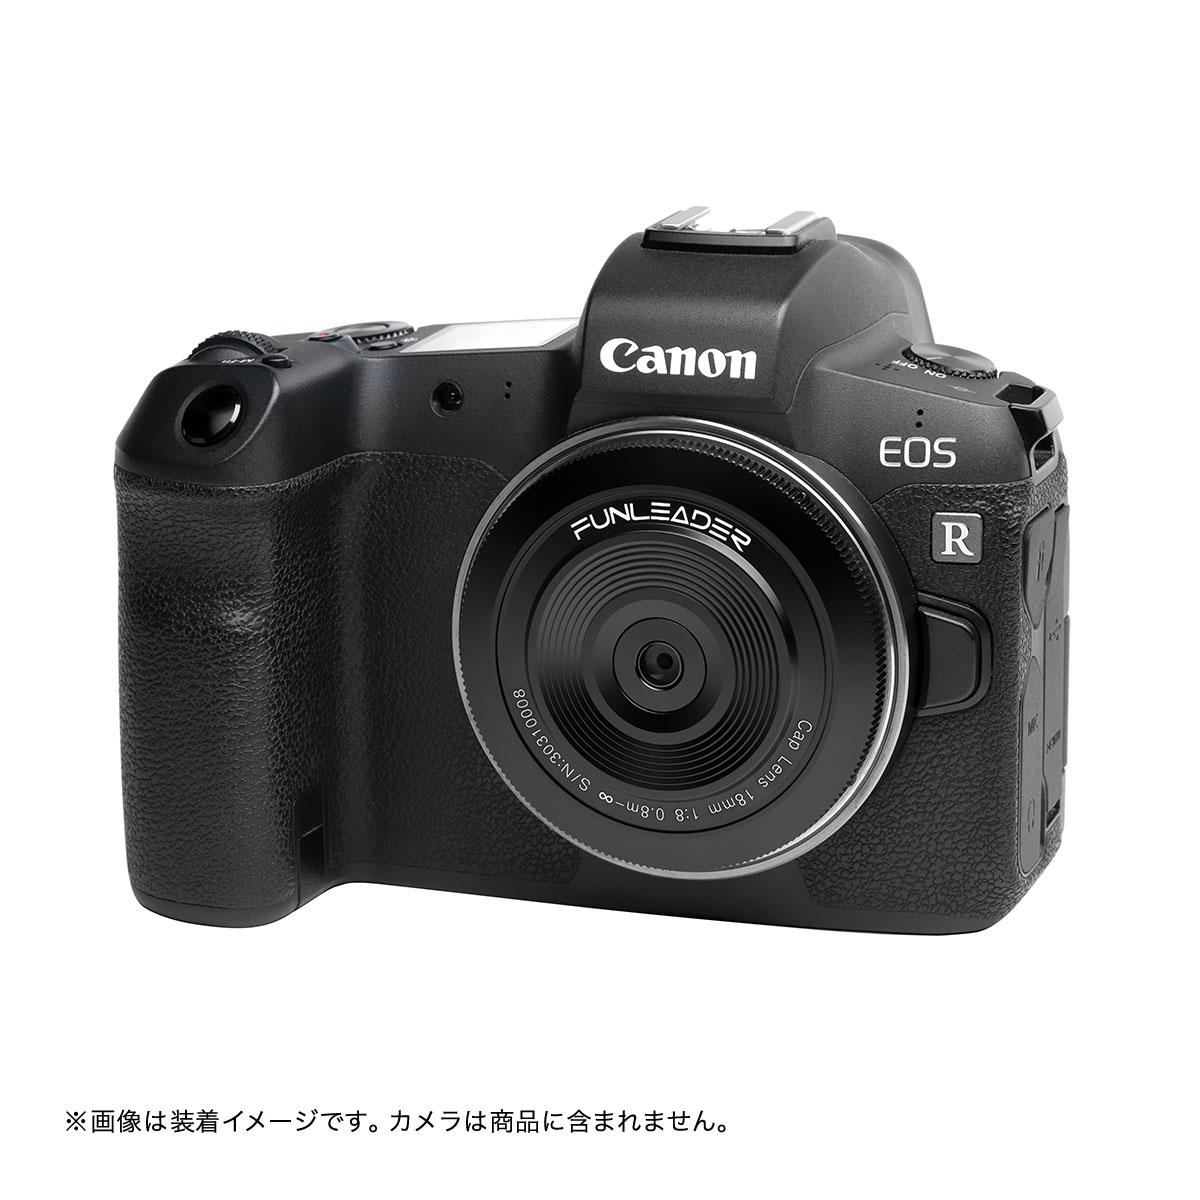 FUNLEADER CAPLENS 18mm f/8.0(ミラーレスカメラ用)